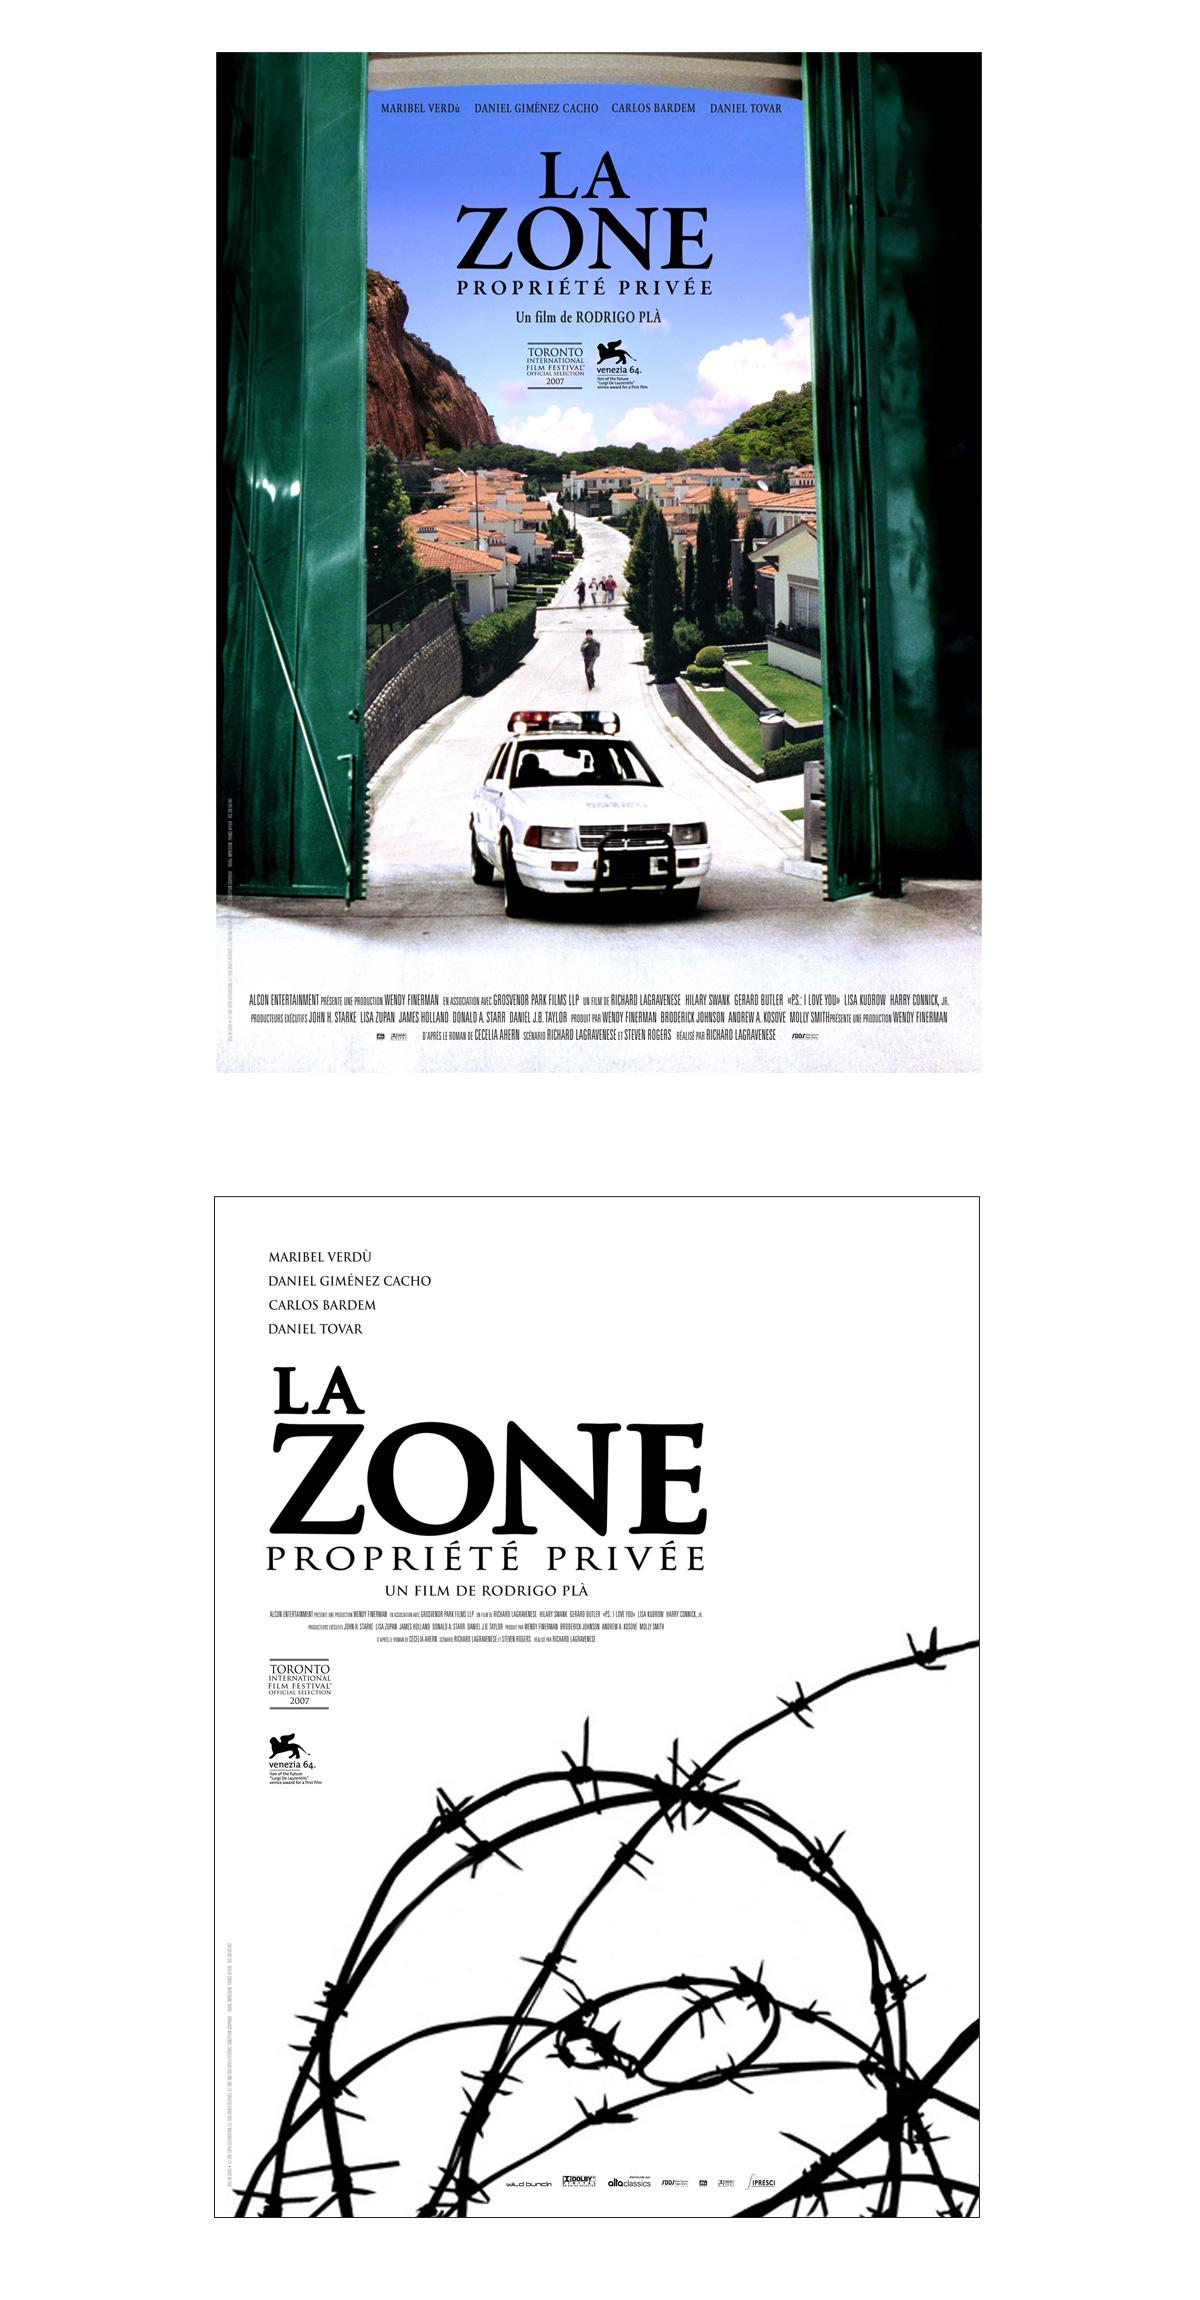 La Zona-0